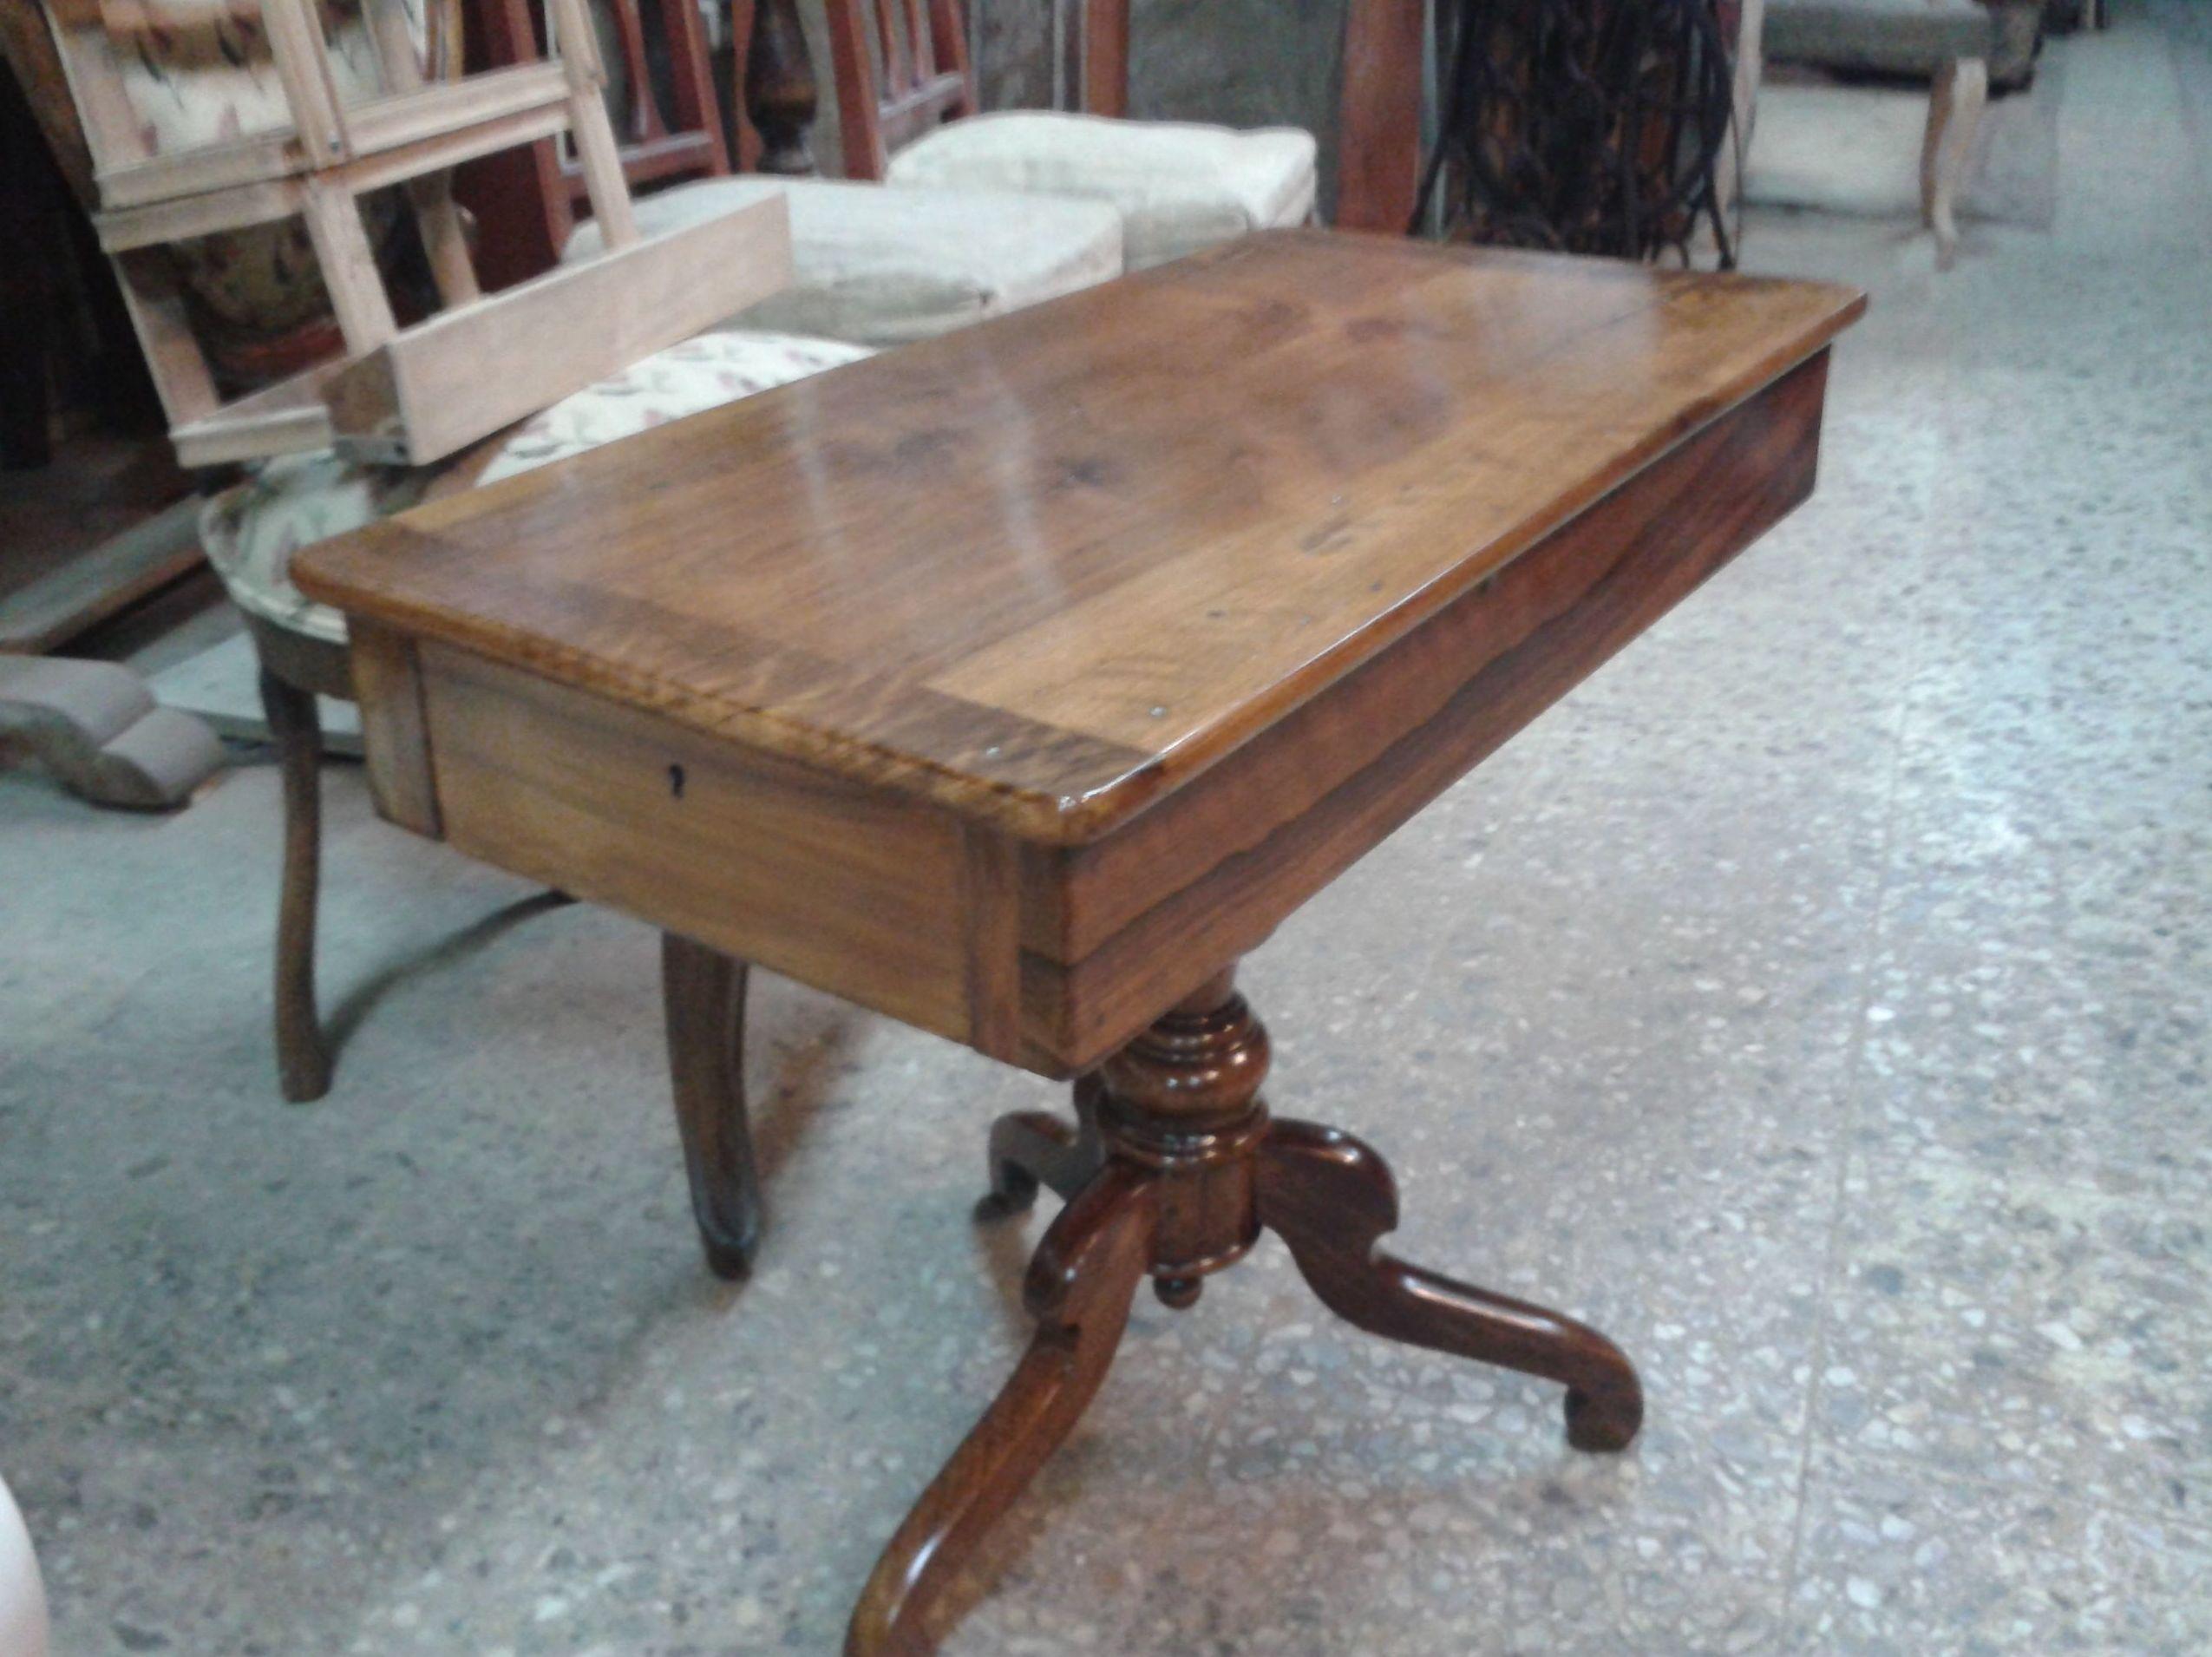 Foto 53 de Restauración de muebles en Pamplona | Lendik Restauración